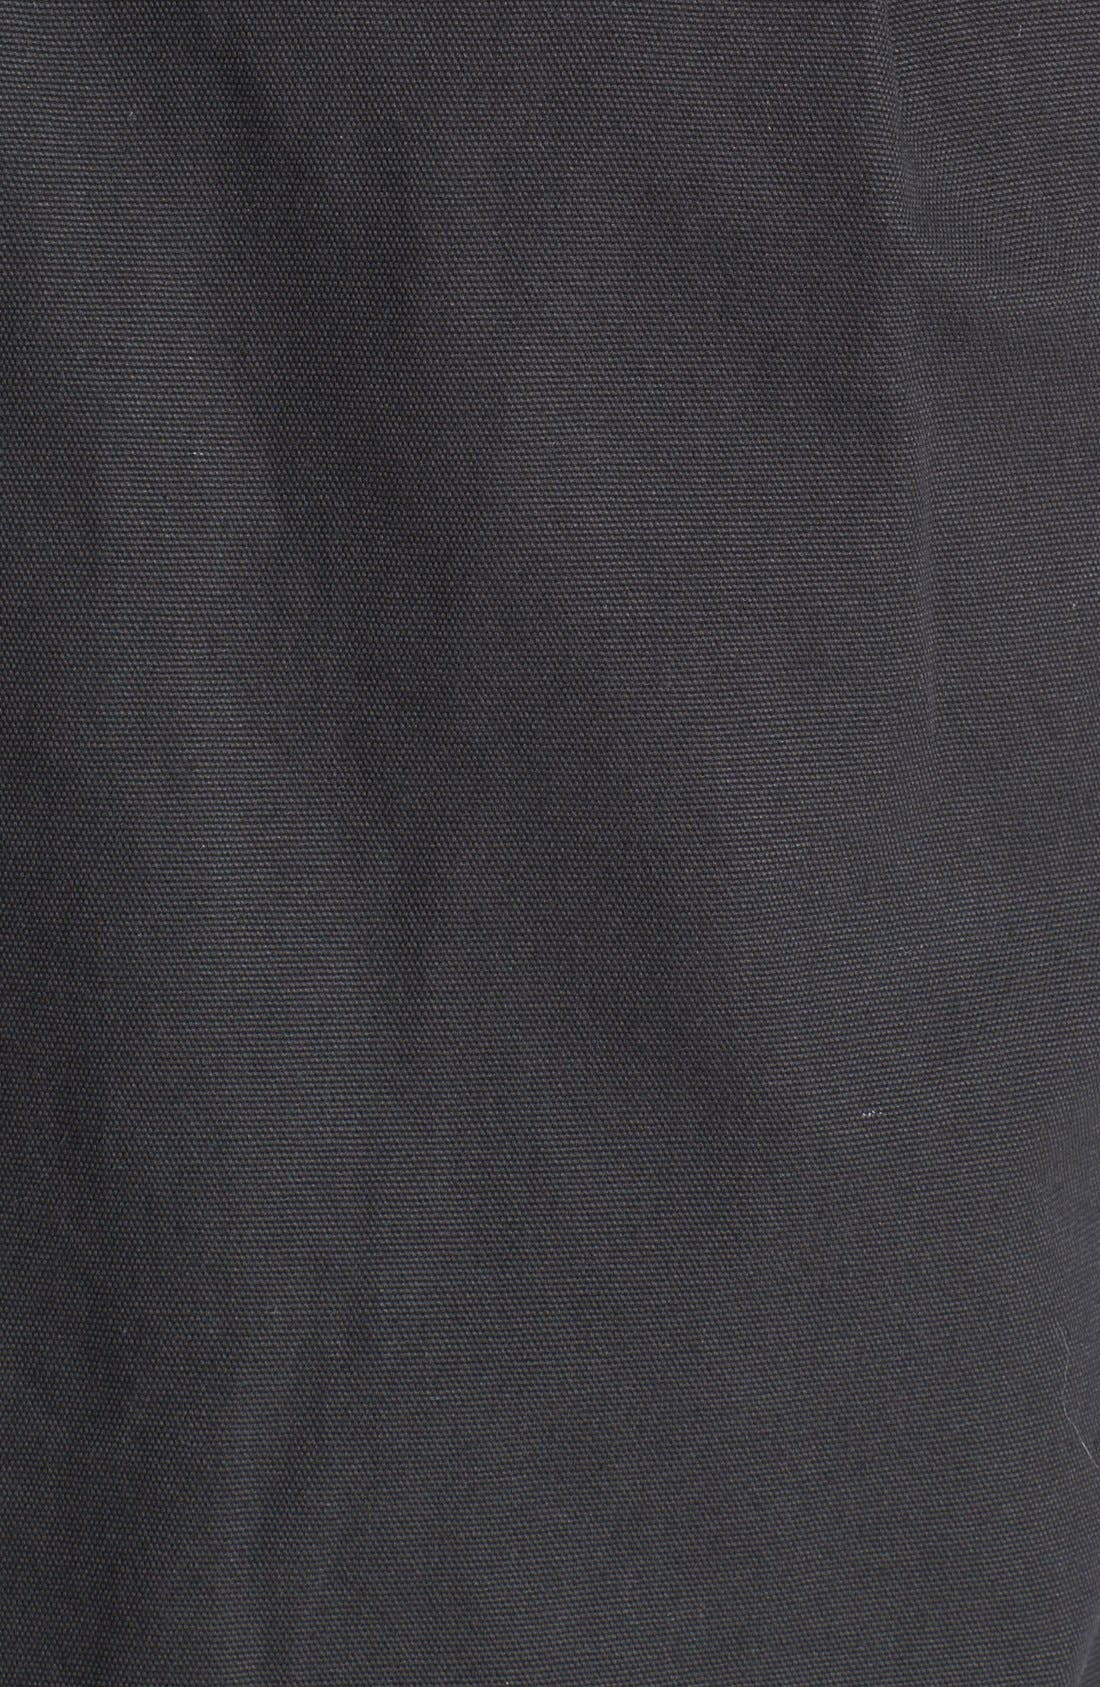 Alternate Image 3  - Vans 'Lismore' Canvas Cotton Hooded Jacket